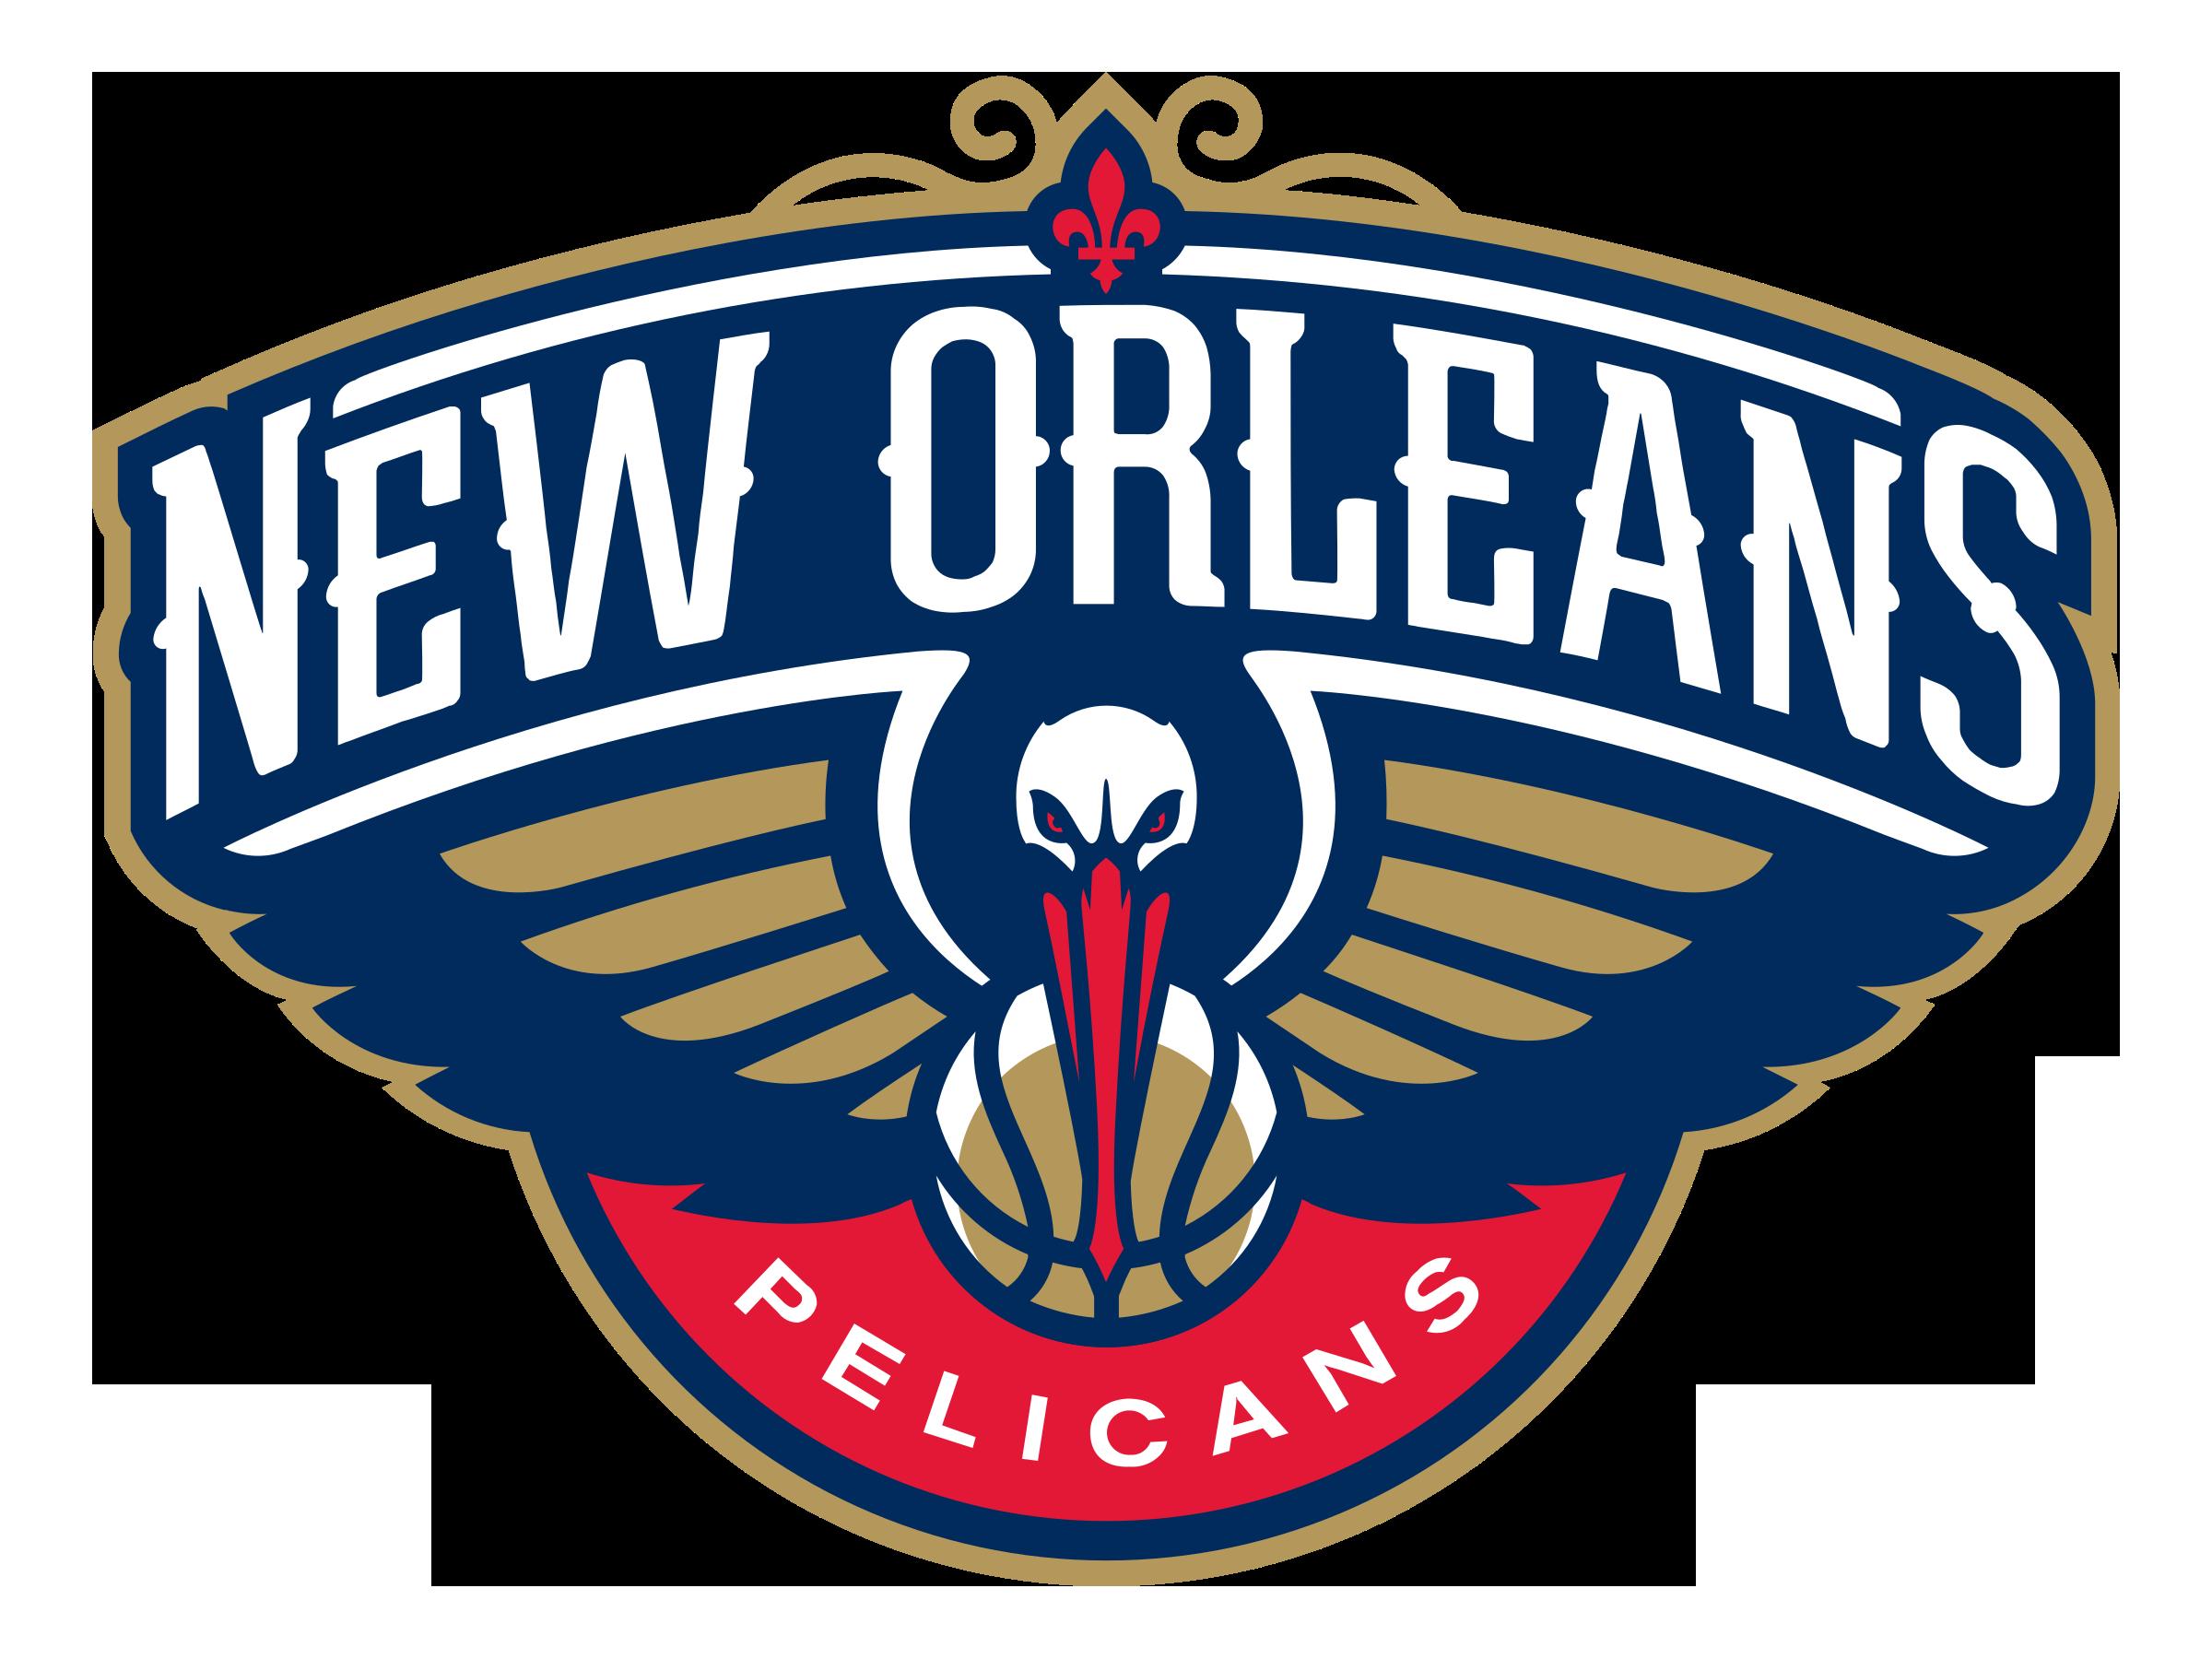 new-orleans-pelicans-logo-transparent.png